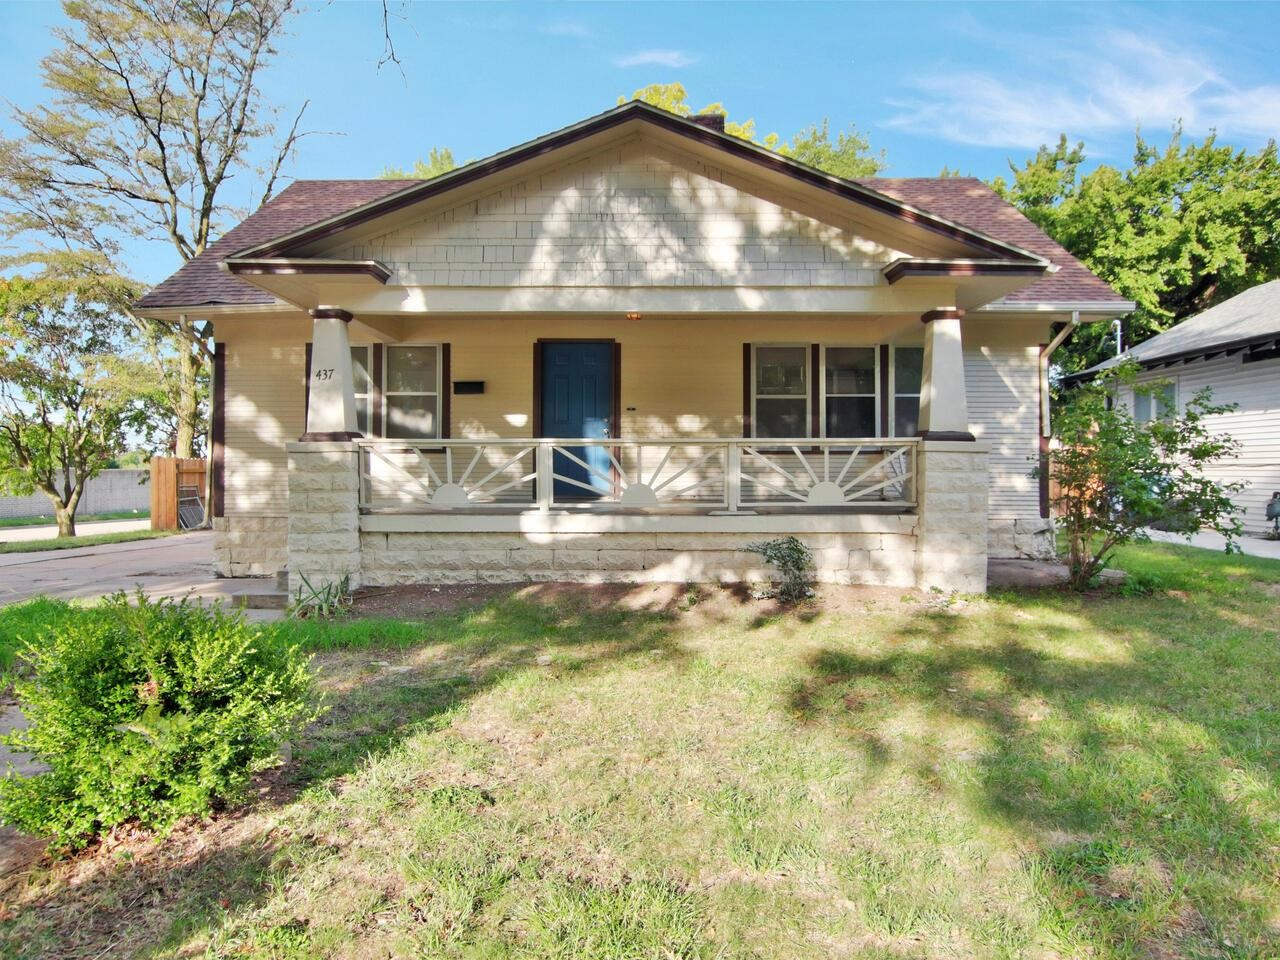 437 S Clifton Ave, Wichita, KS, 67218